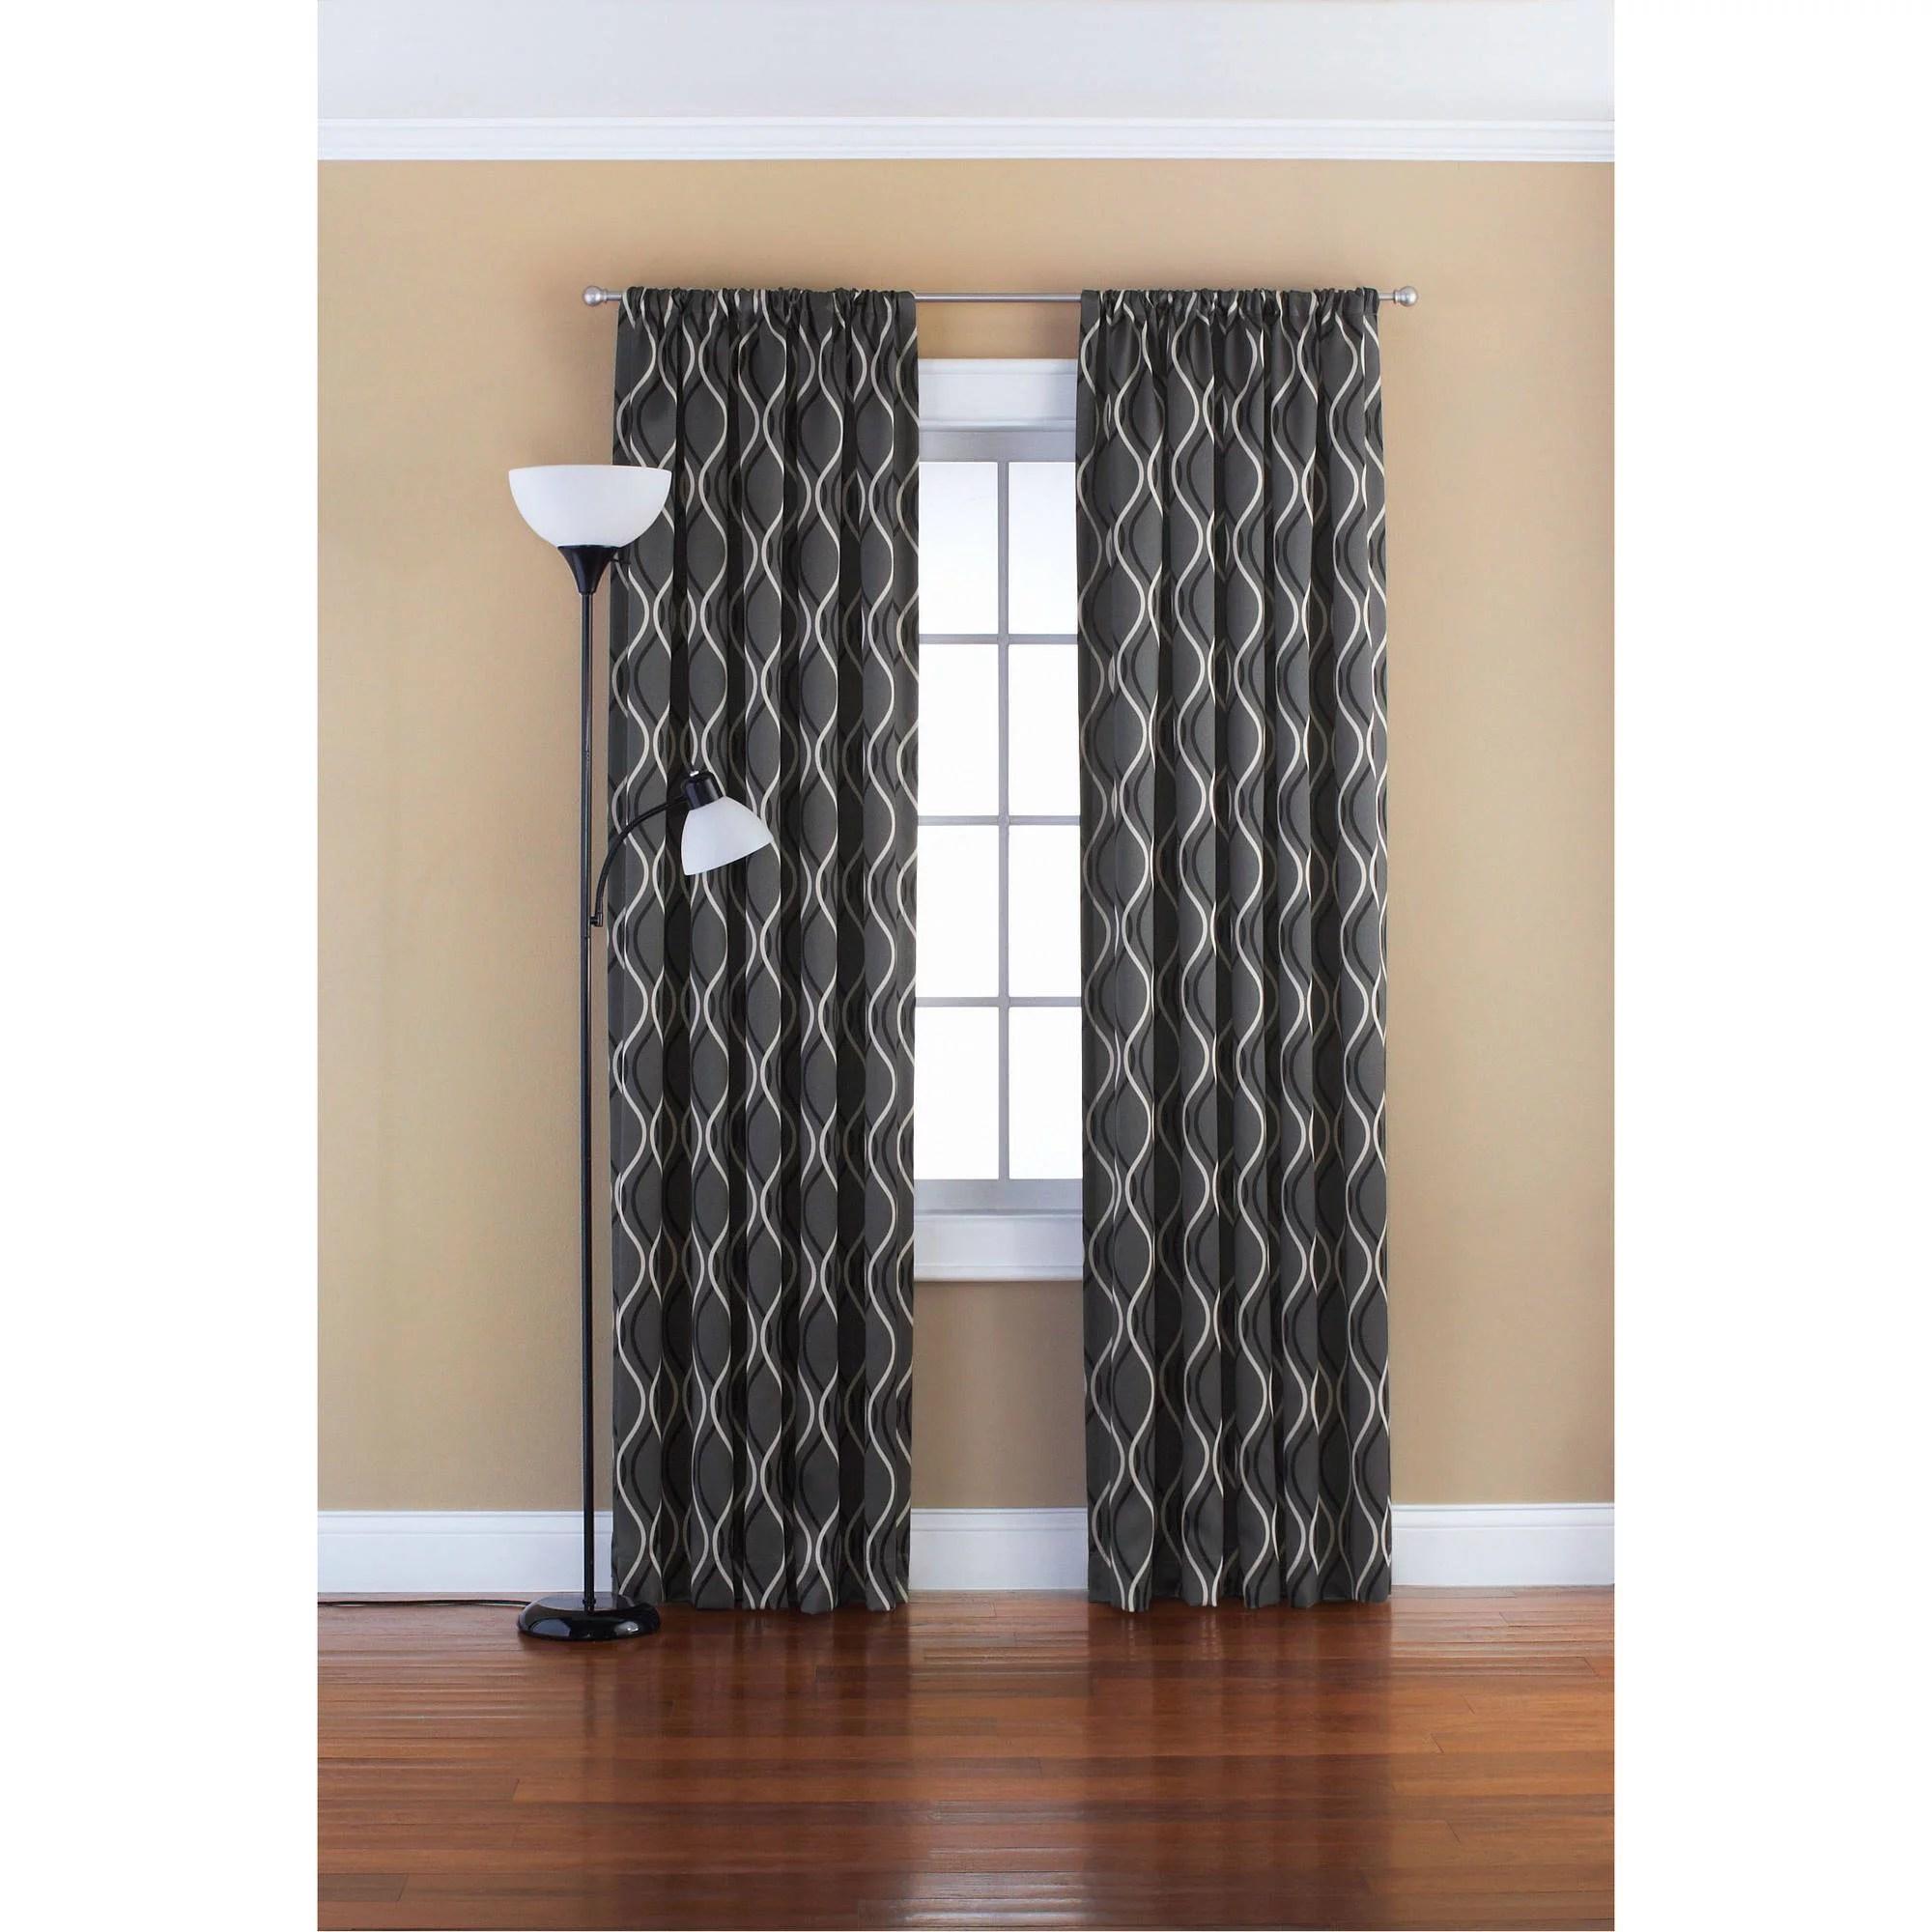 Mainstays Wave Room Darkening Polyester Curtain Panel Grey